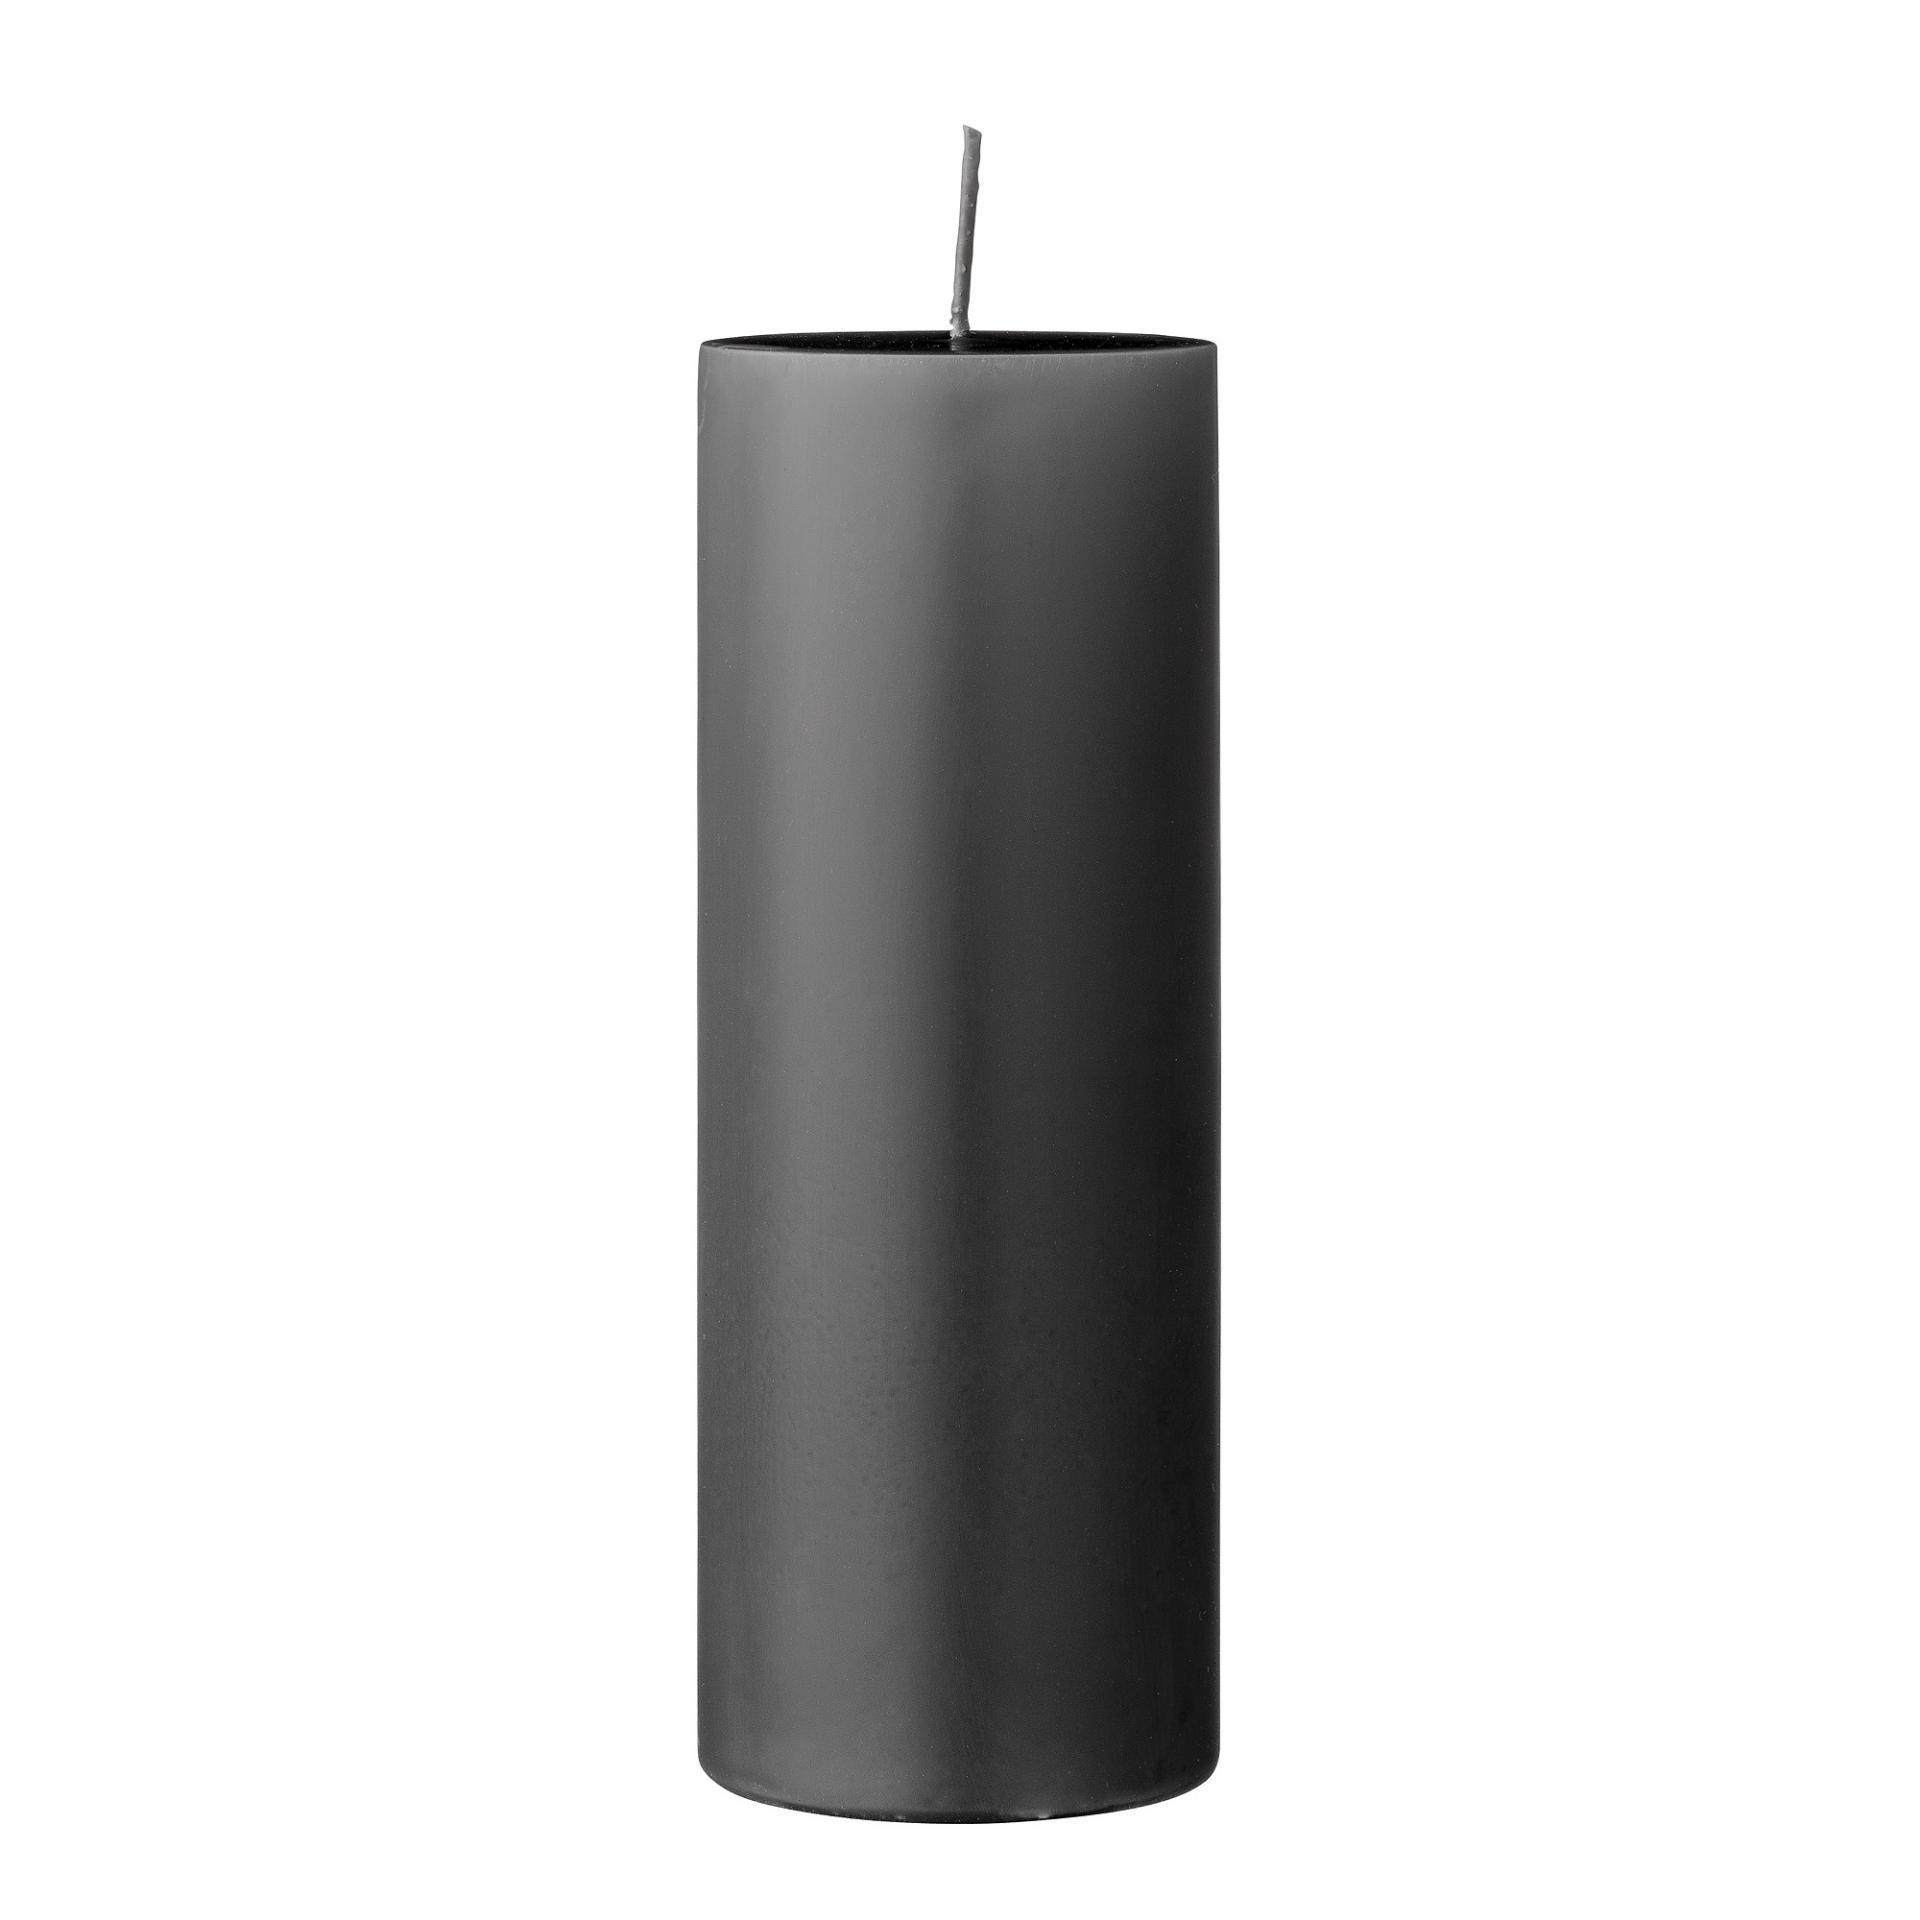 Bloomingville Svíčka Grey 20 cm, šedá barva